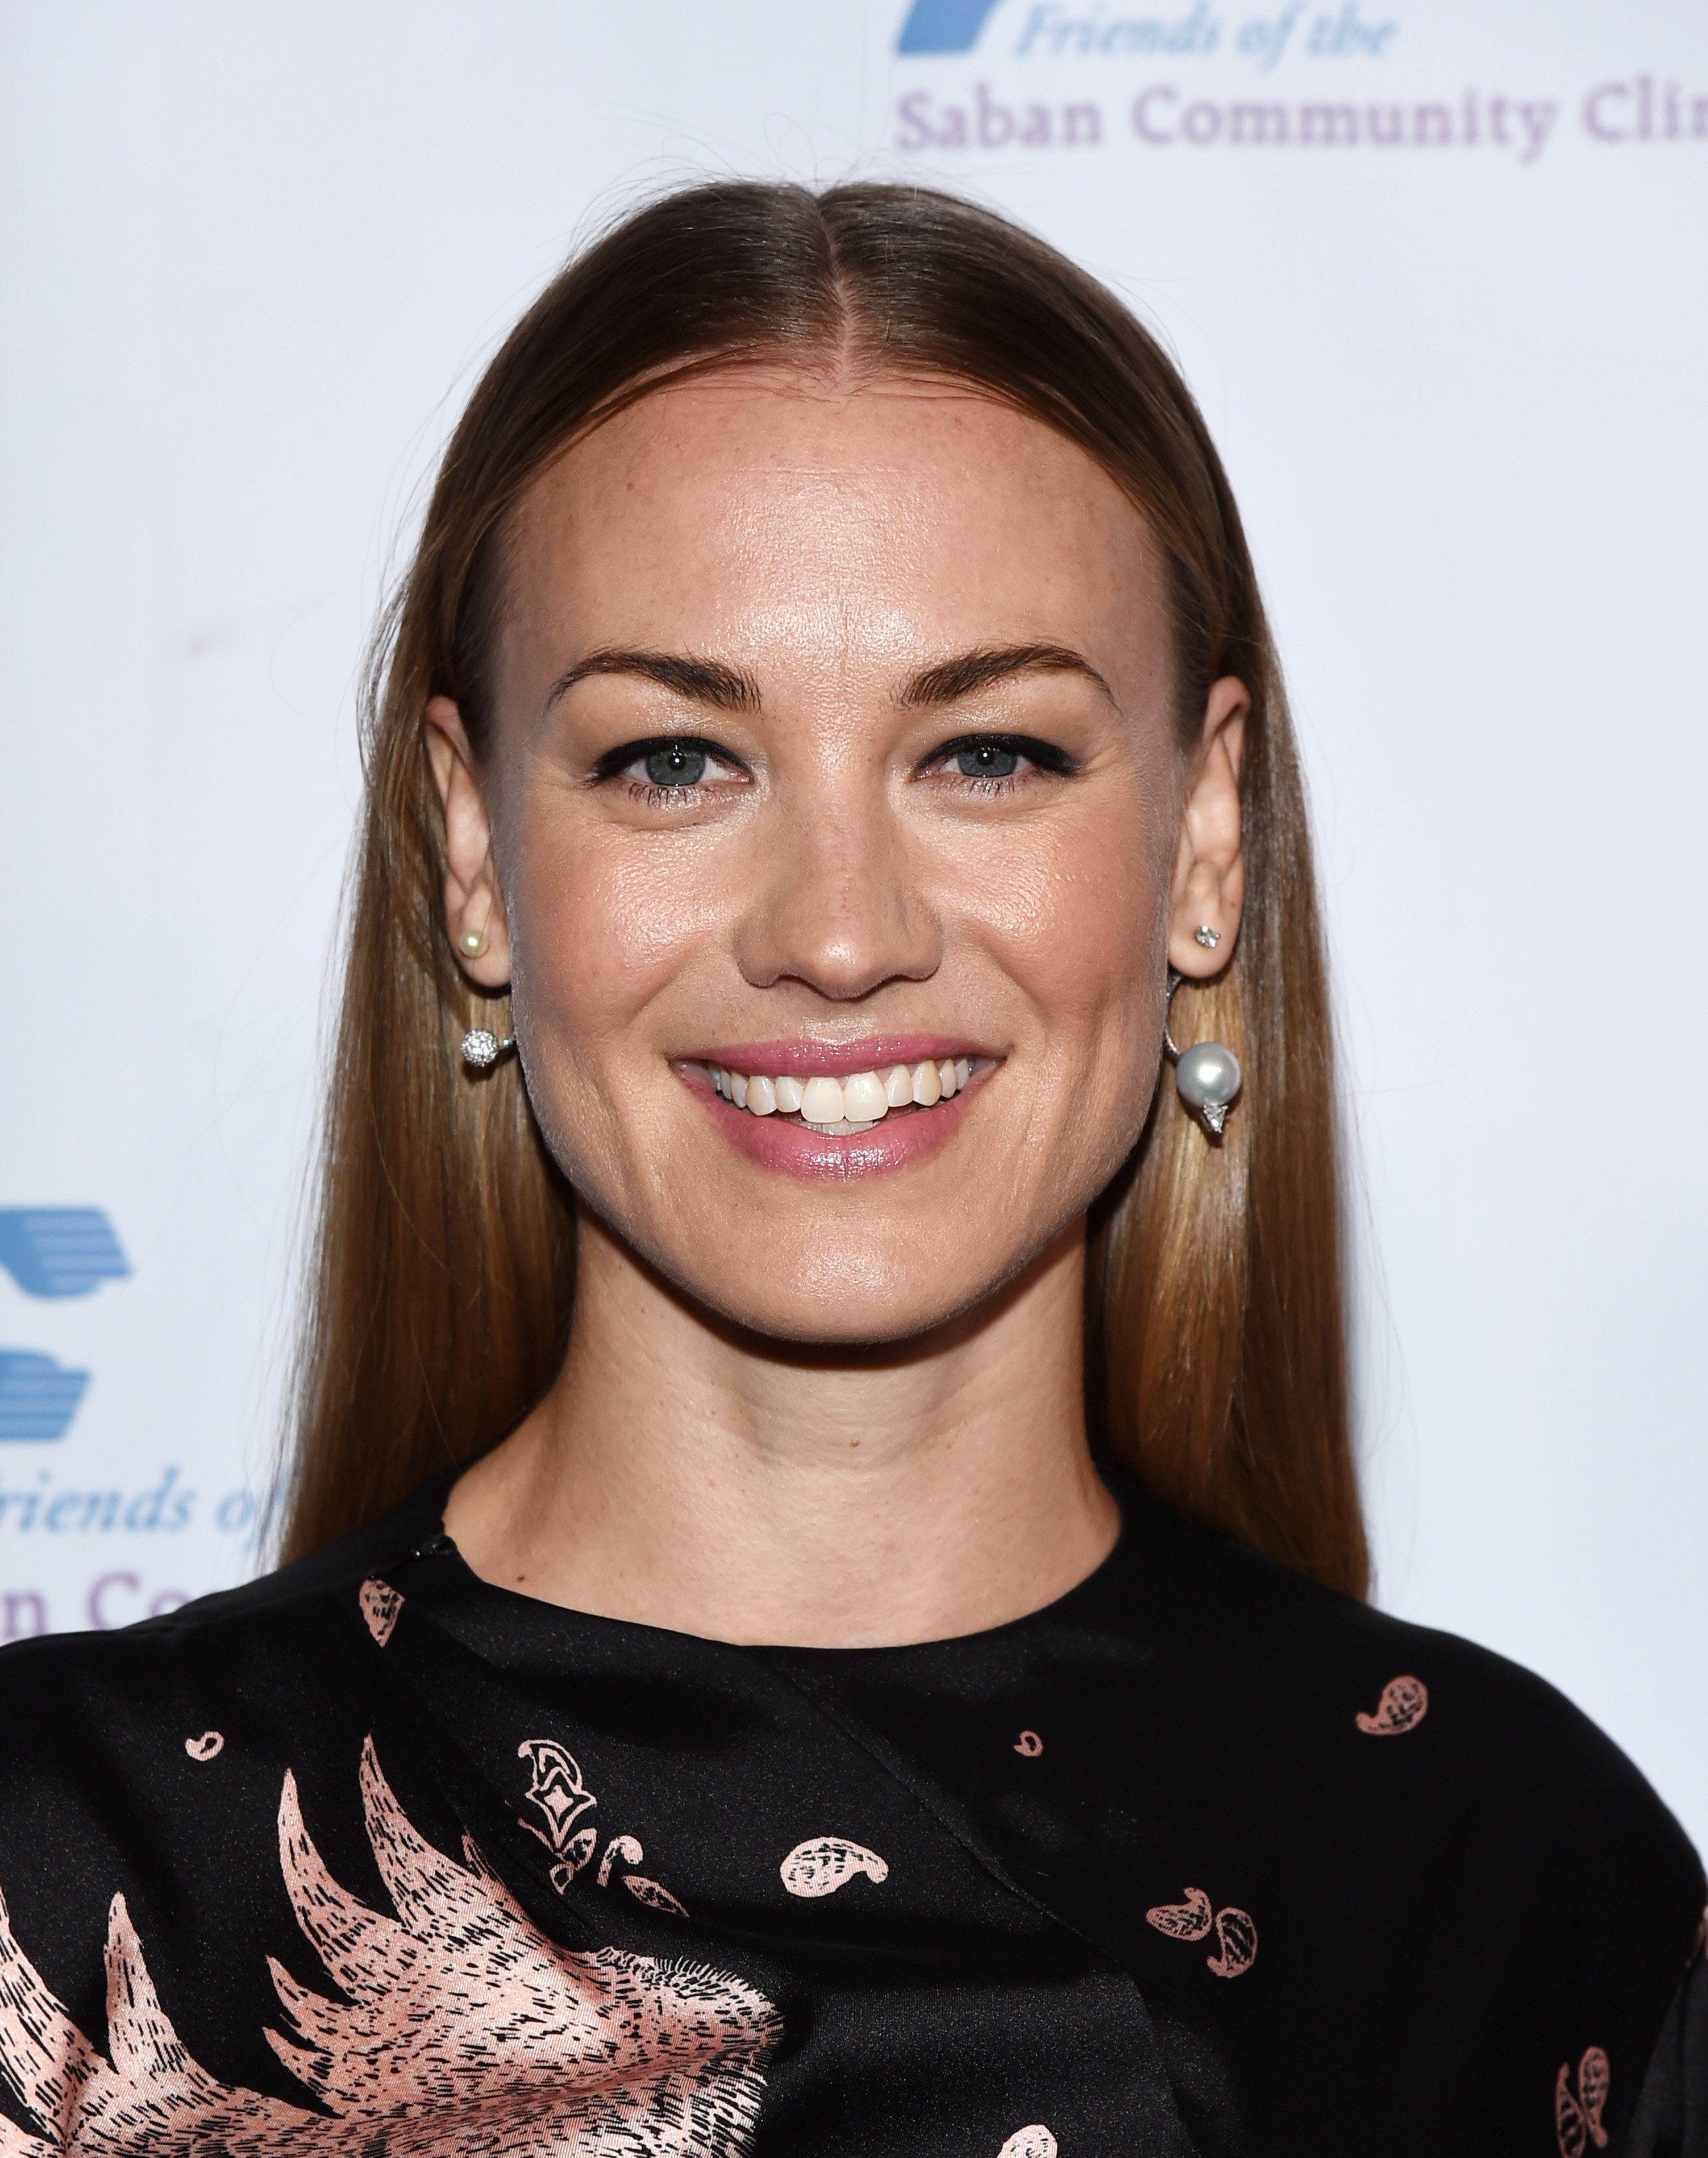 Yvonne Strahovski smiles in printed black dress and pearl-drop earrings